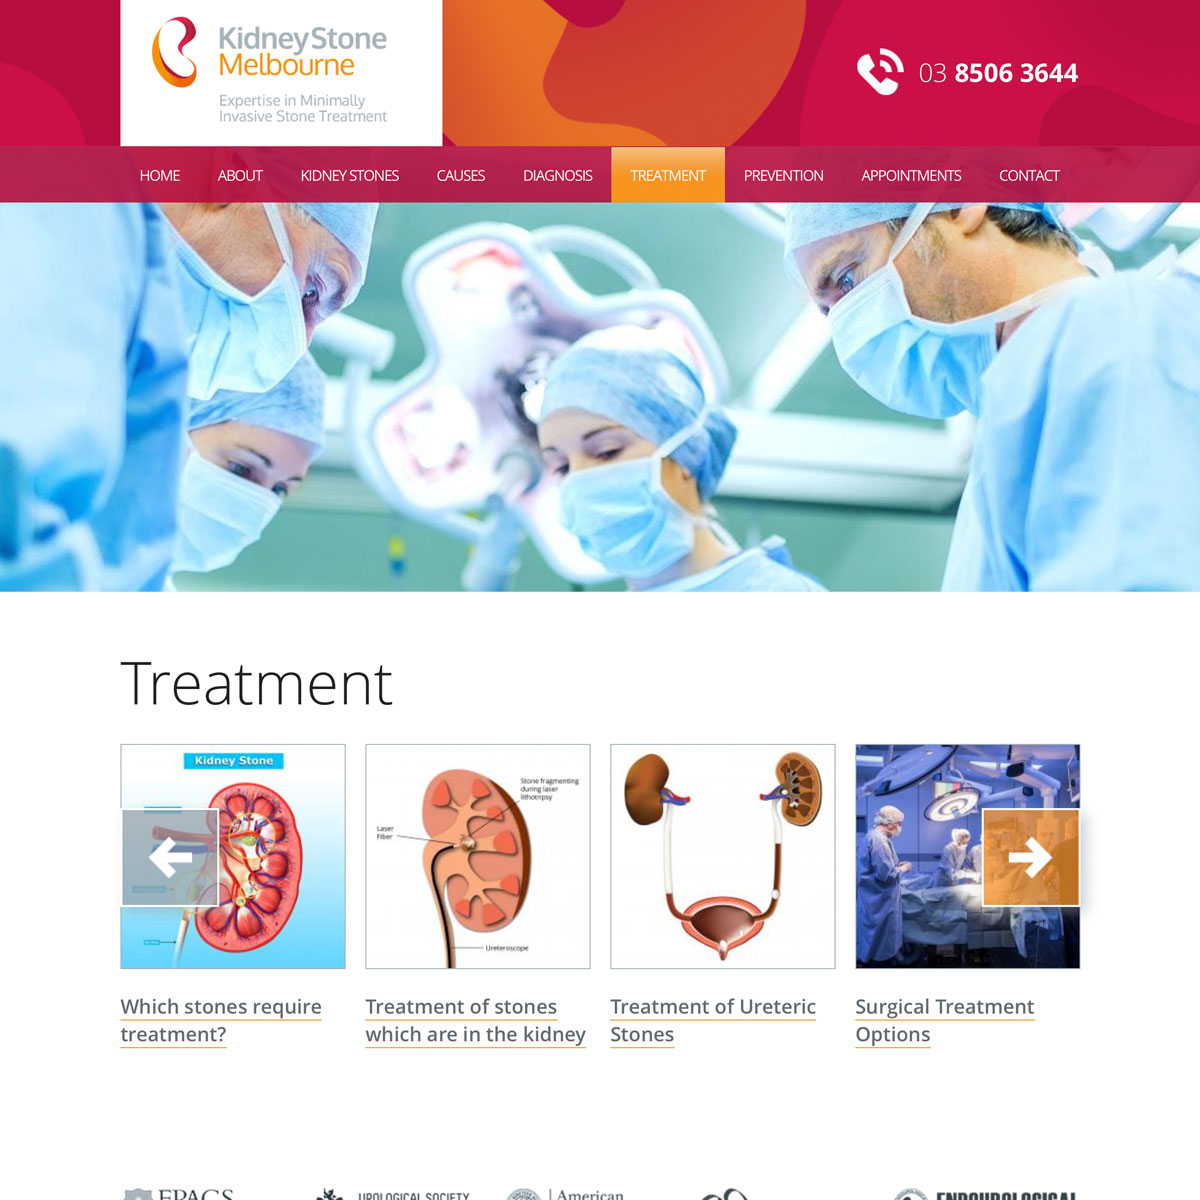 Kidney Stone Melbourne - Treatment